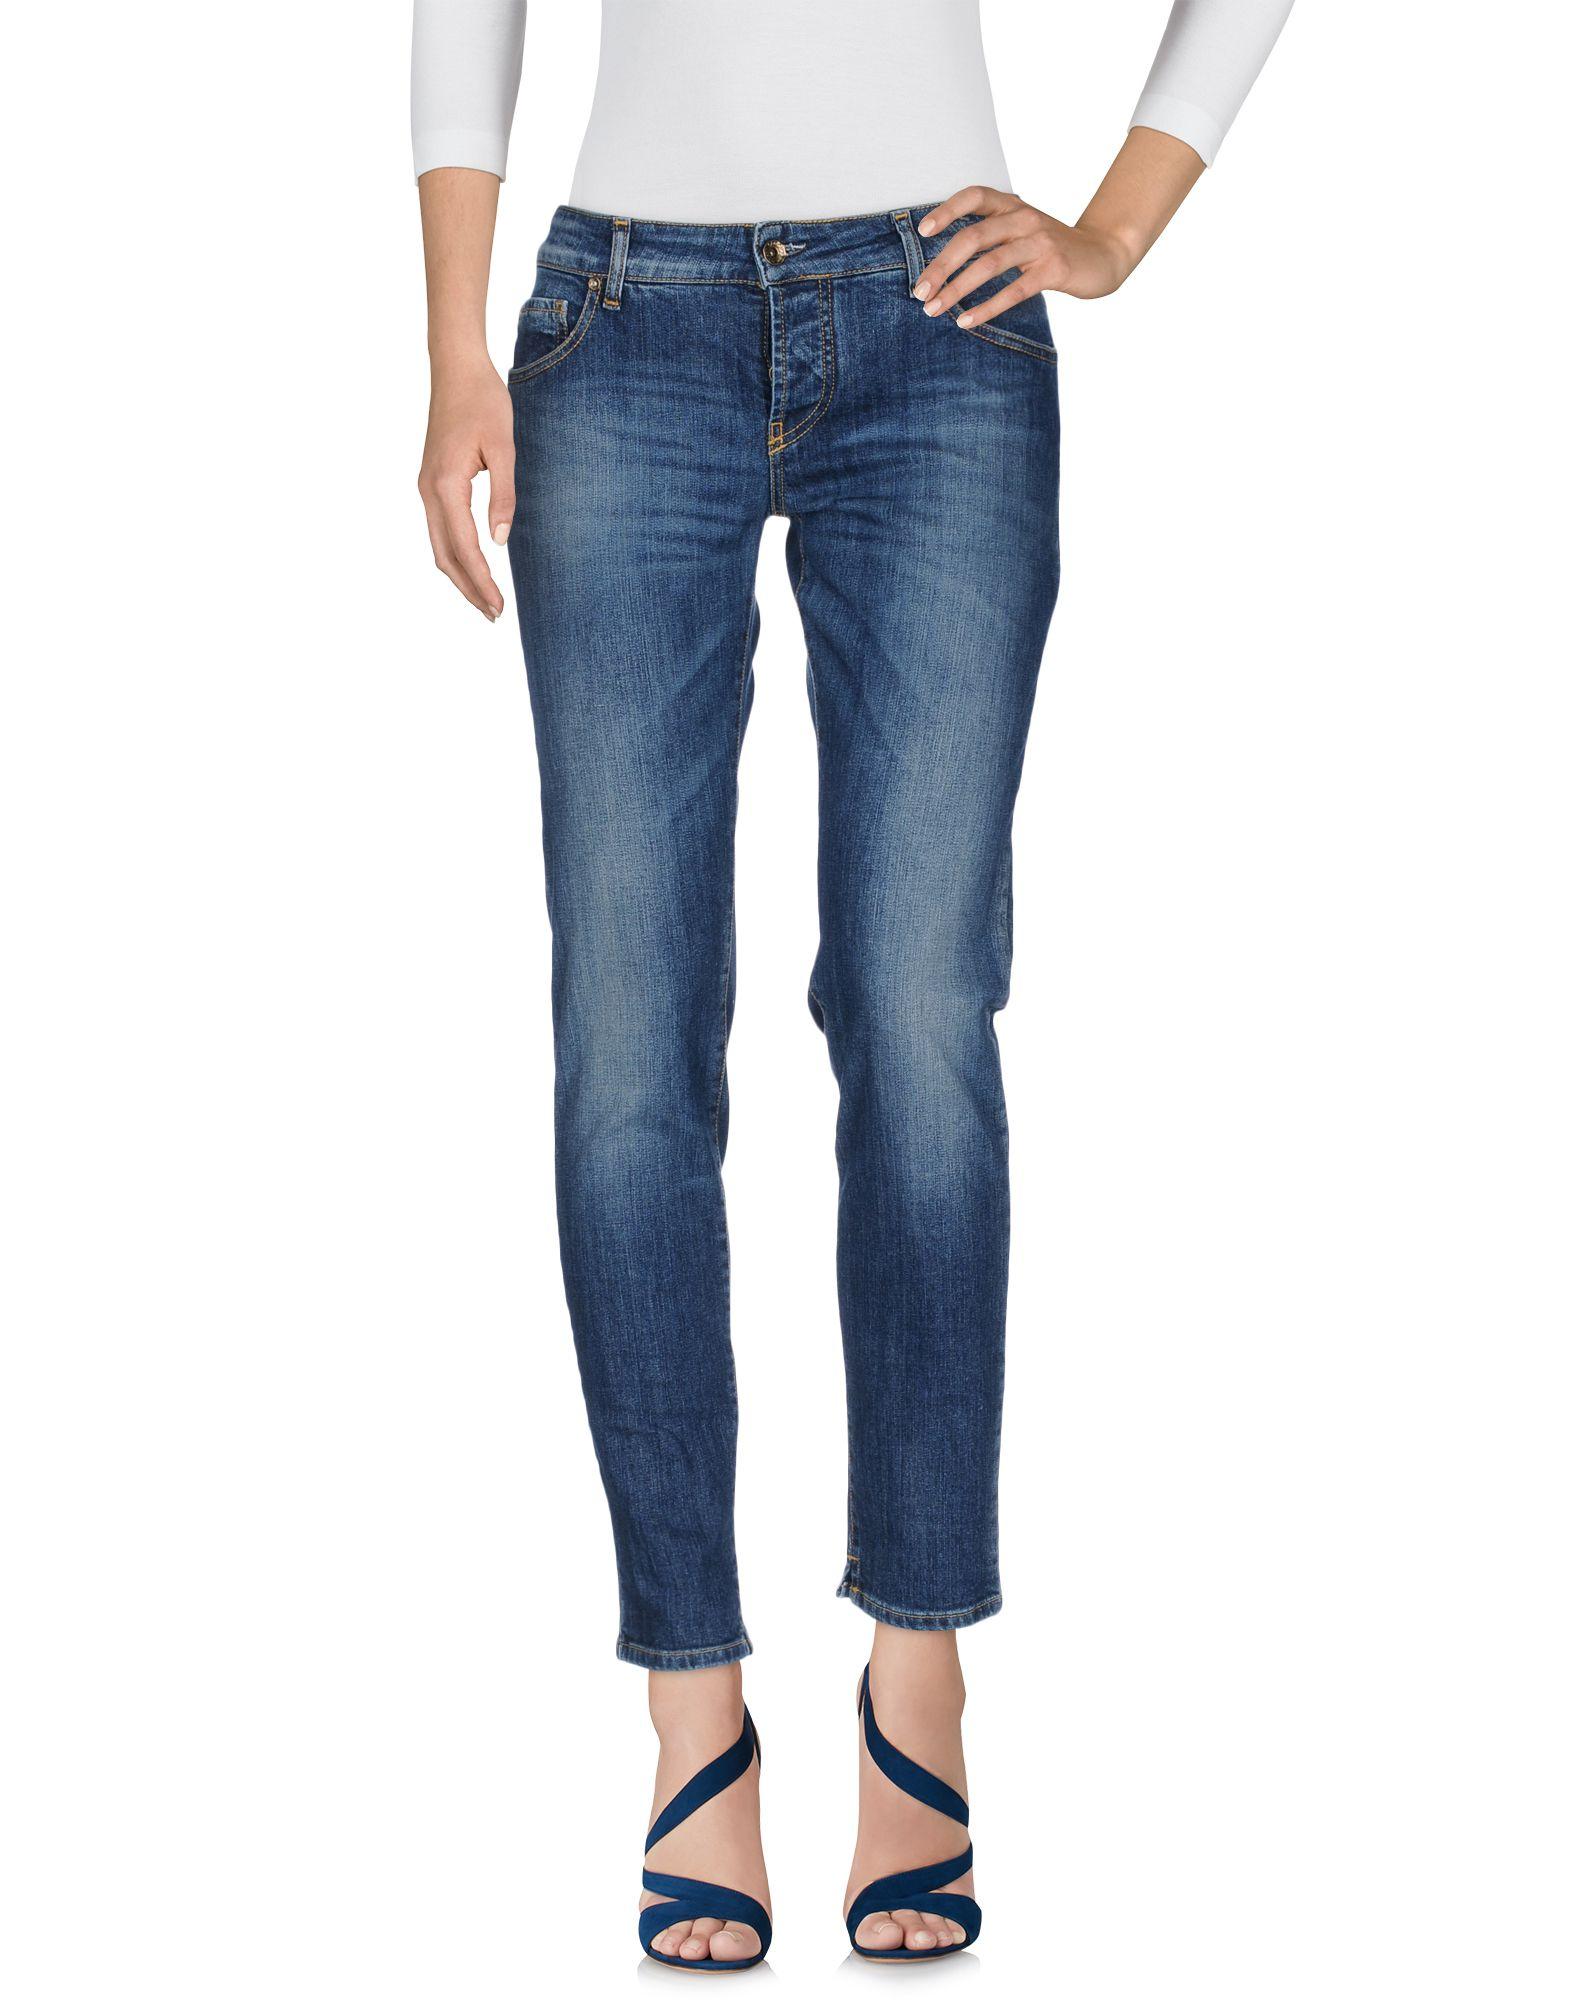 Pantaloni Jeans Maison Clochard damen - 42616344IC